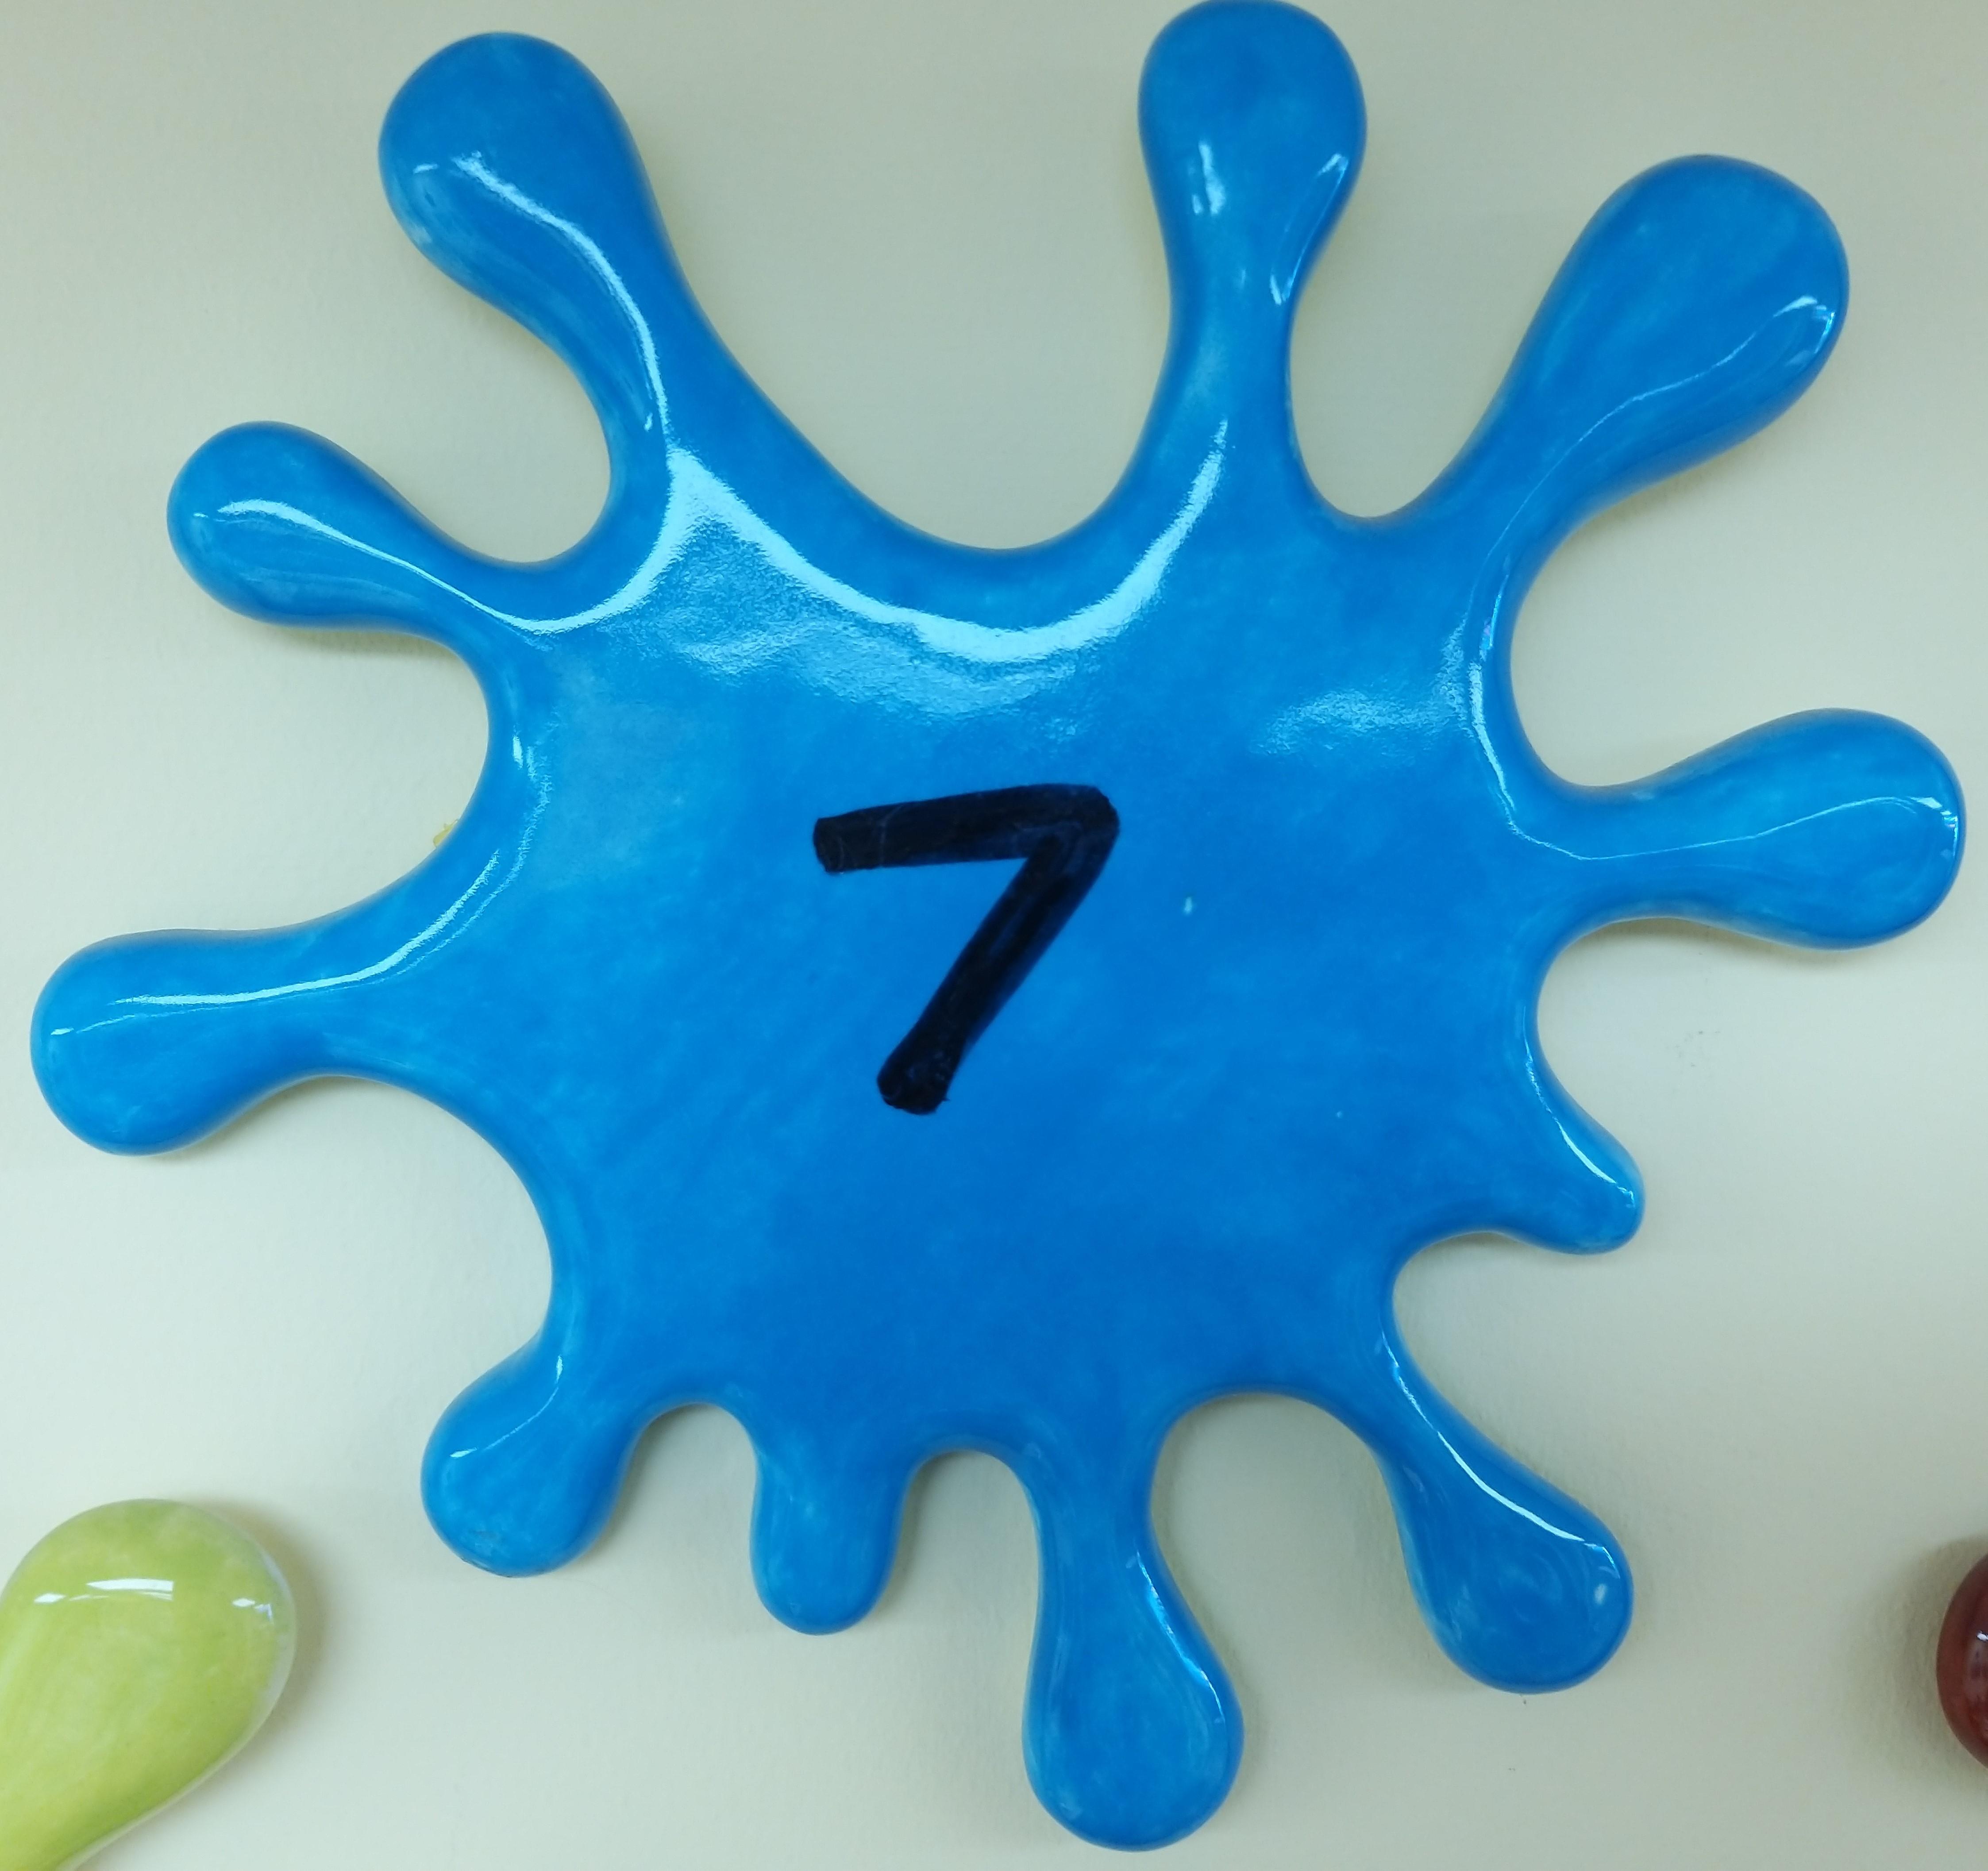 07. Bright Blue